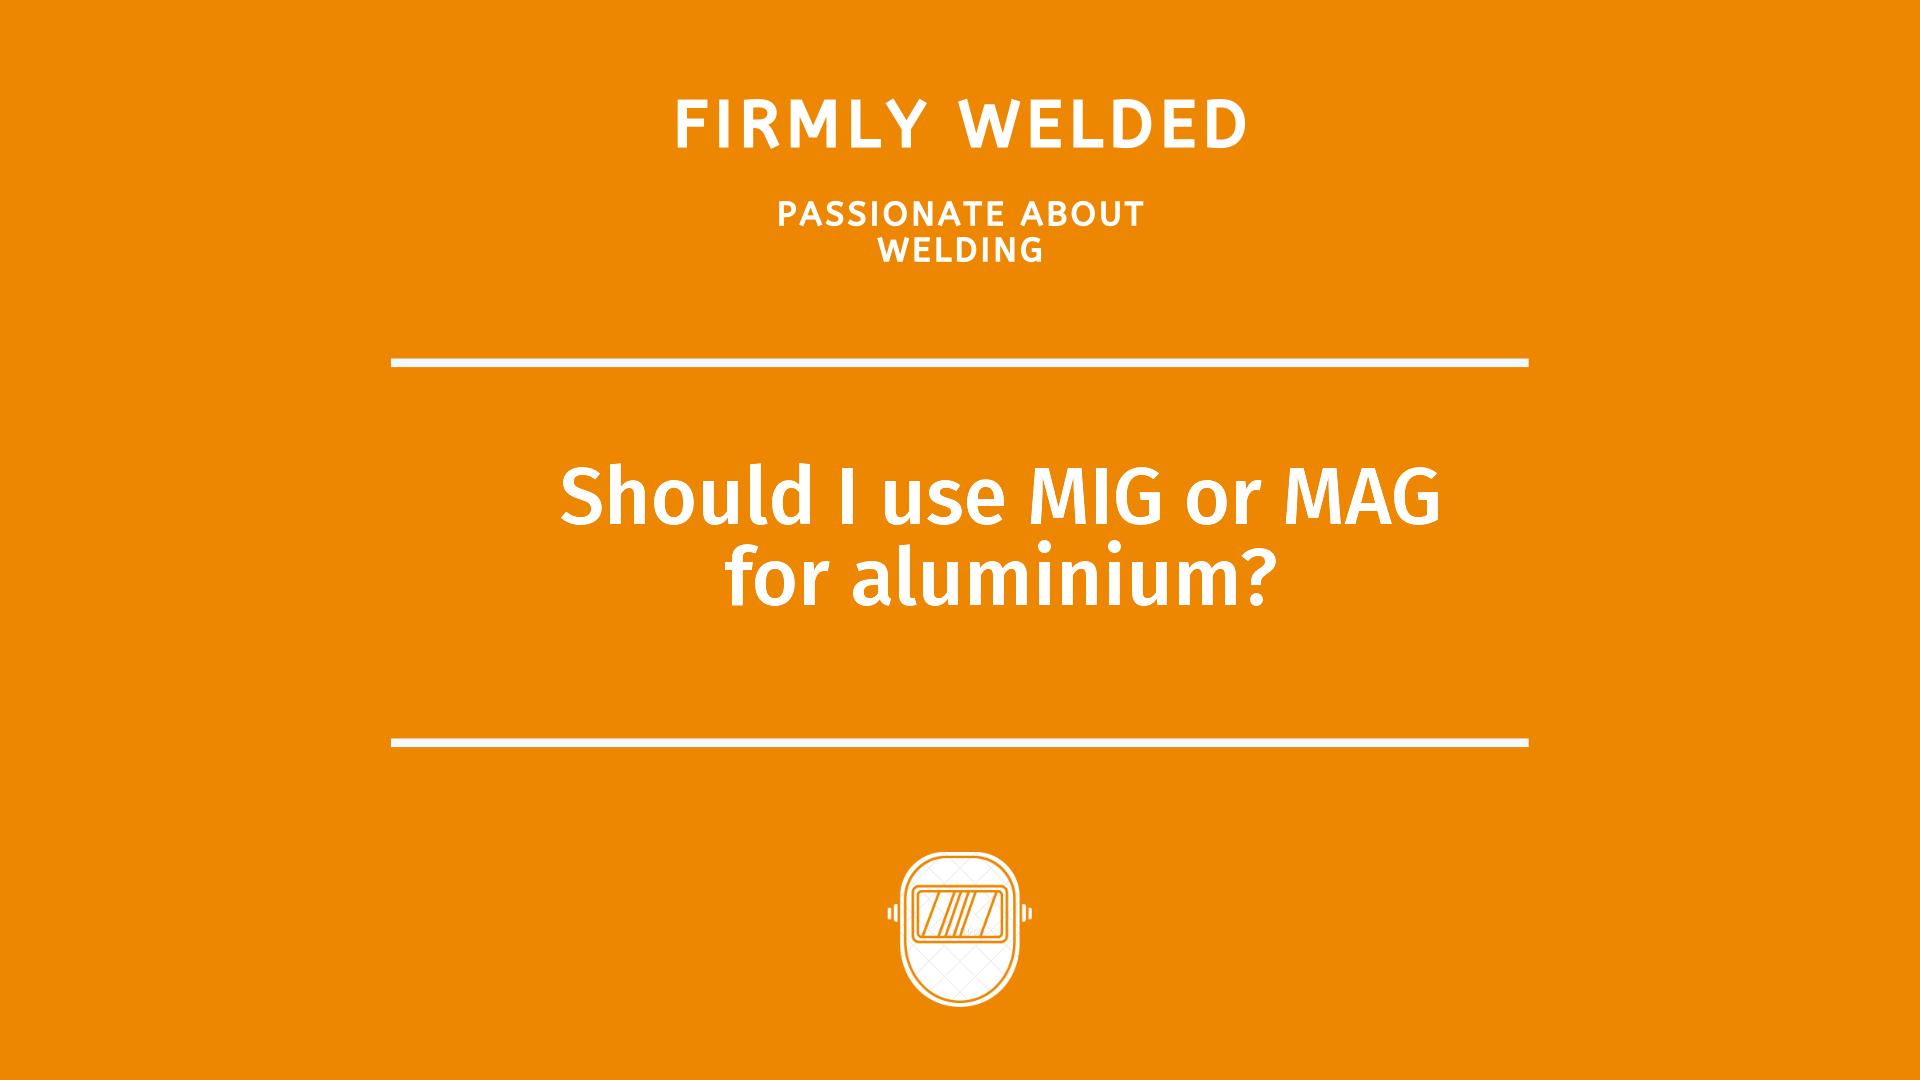 Should I use MIG or MAG for aluminium?